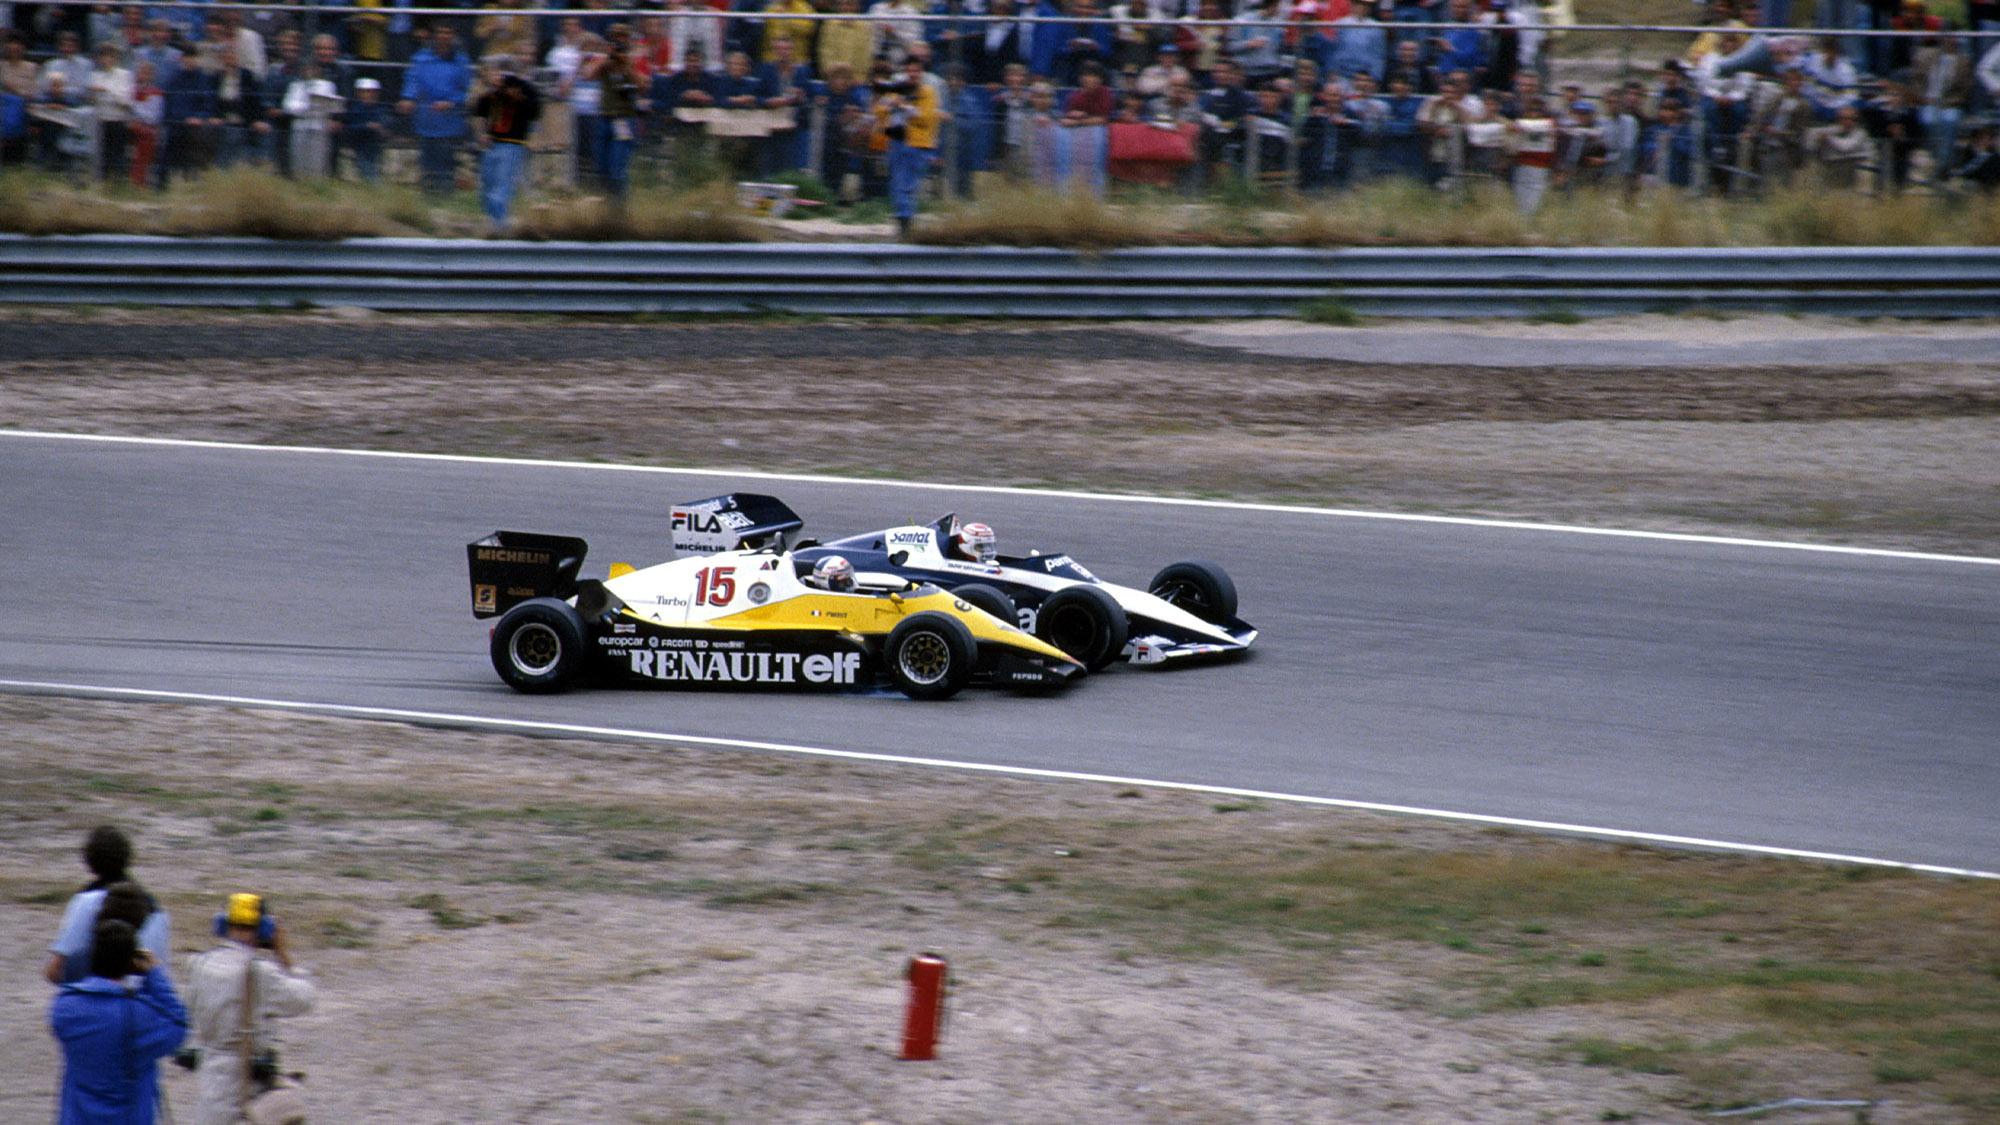 Alain Prost hits Nelson Piquet in the 1983 Dutch Grand Prix